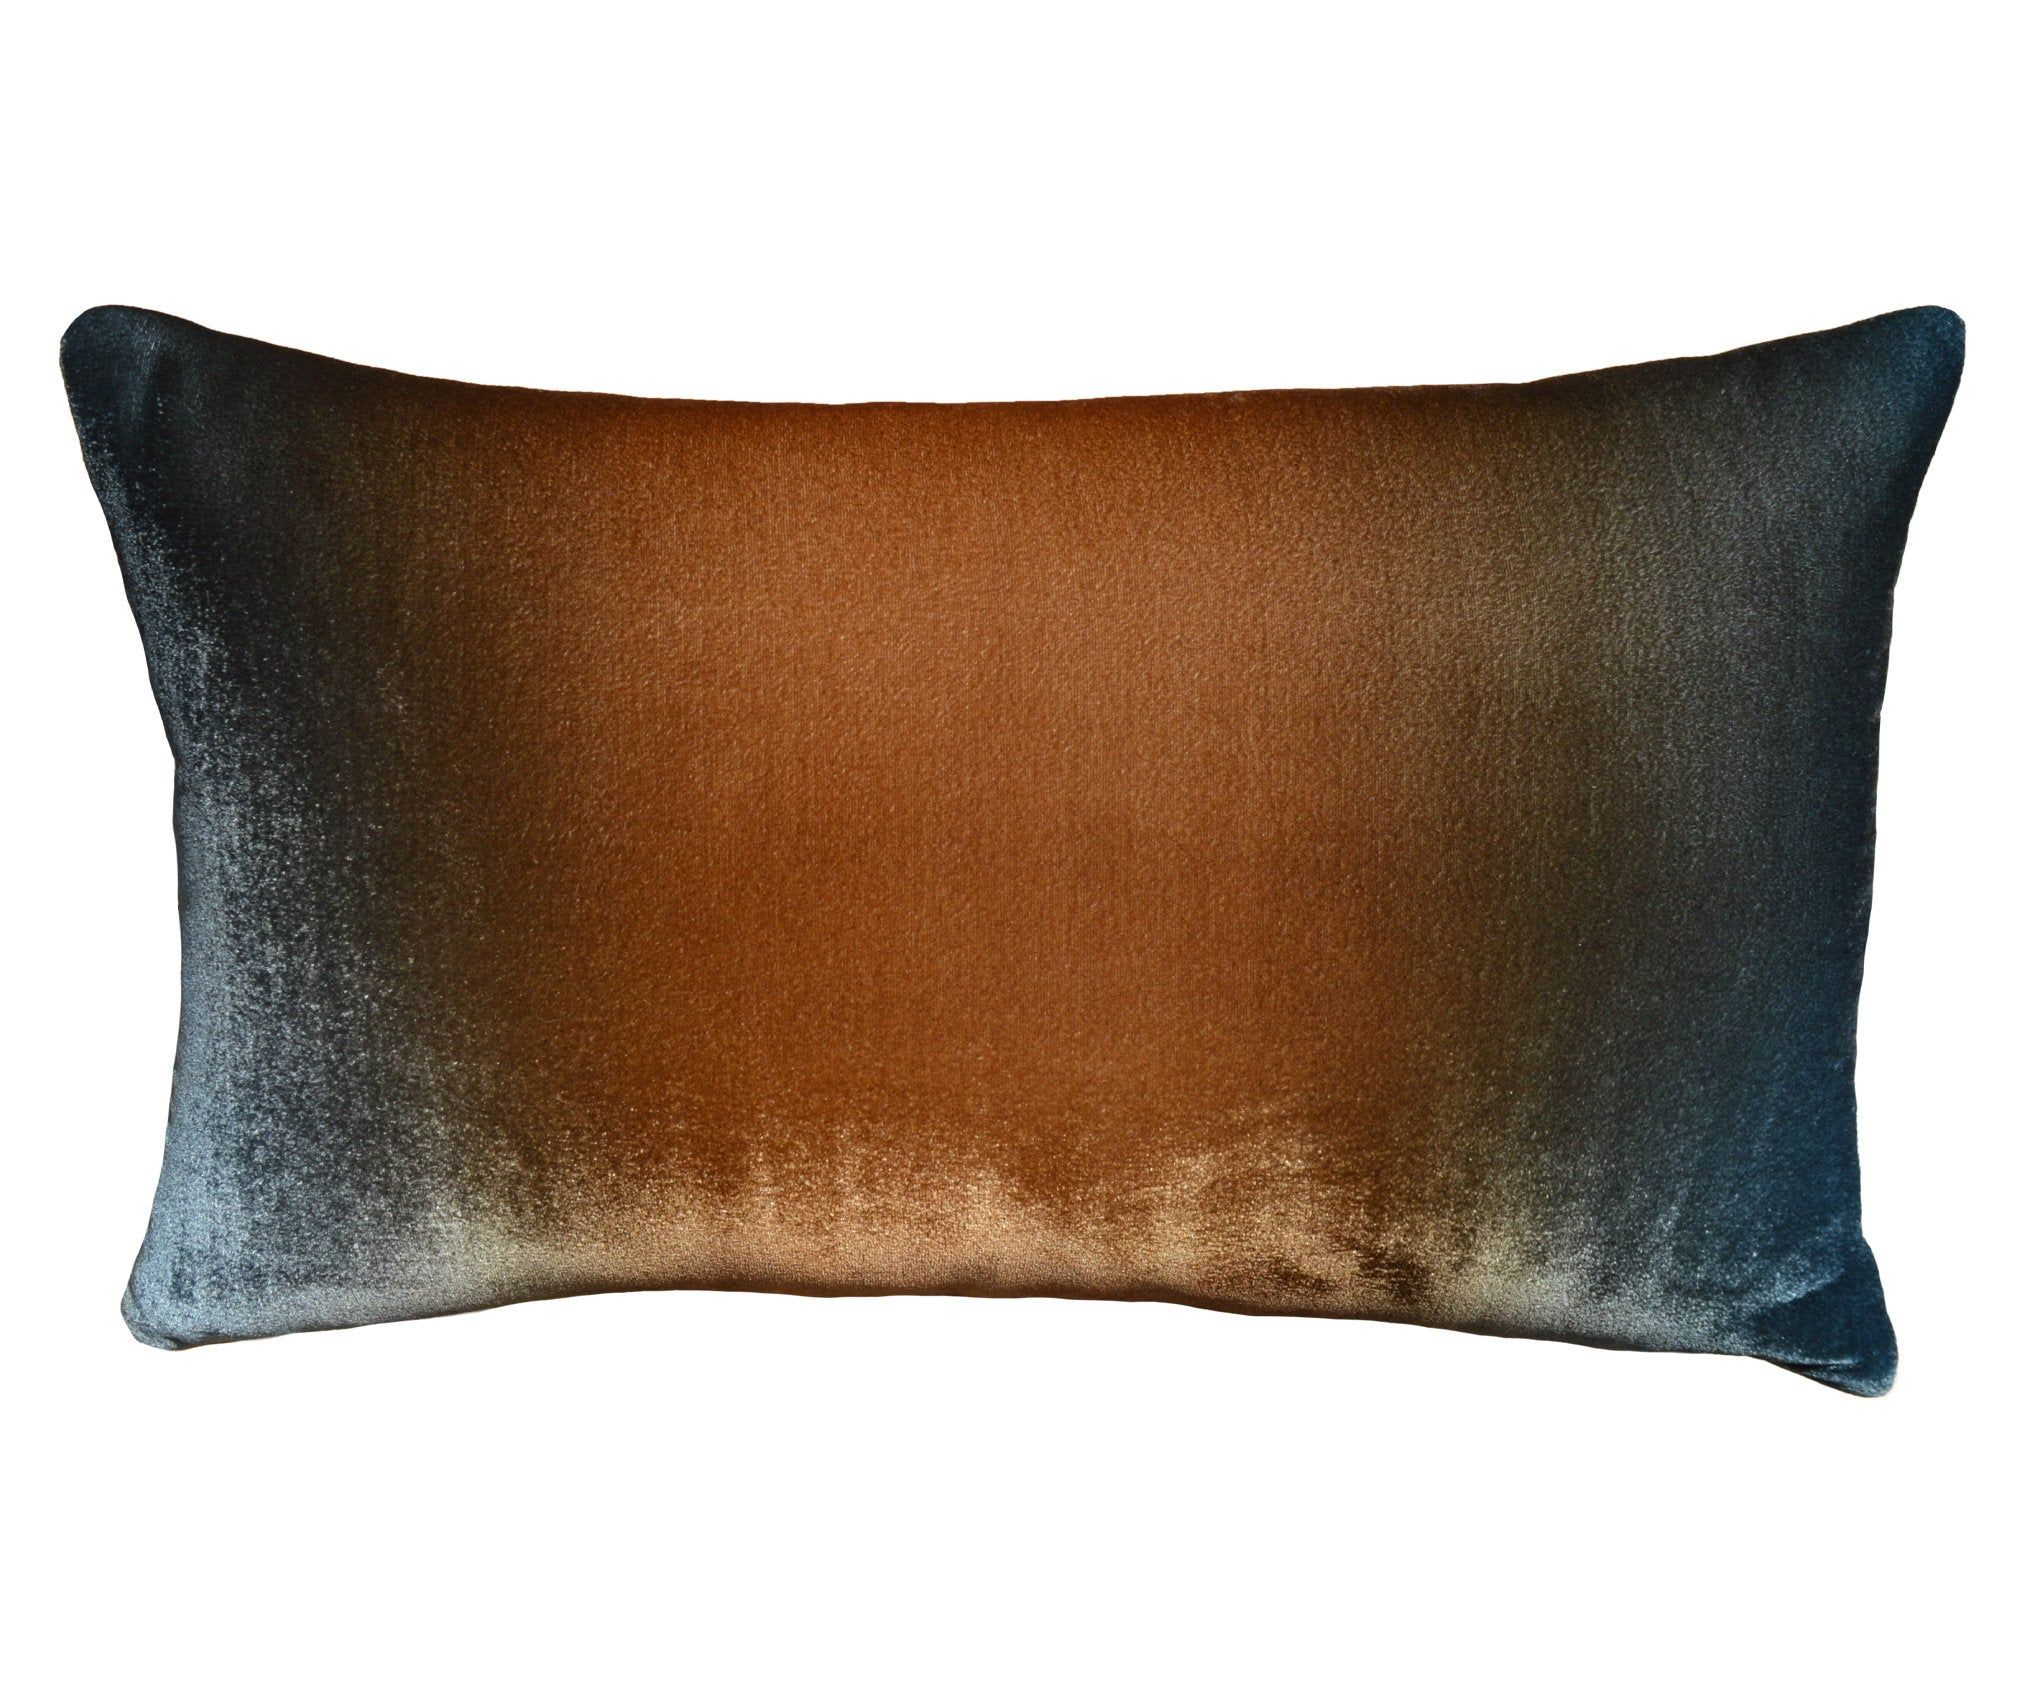 Ombre Velvet Pillow Cover 12x19 Hand Painted Silk Velvet Brown To Blue Ombre Velvet Lumbar Pillow For Couch Luxury Handmade By Fabric17 Velvet Pillow Covers Velvet Pillows Pillow Covers